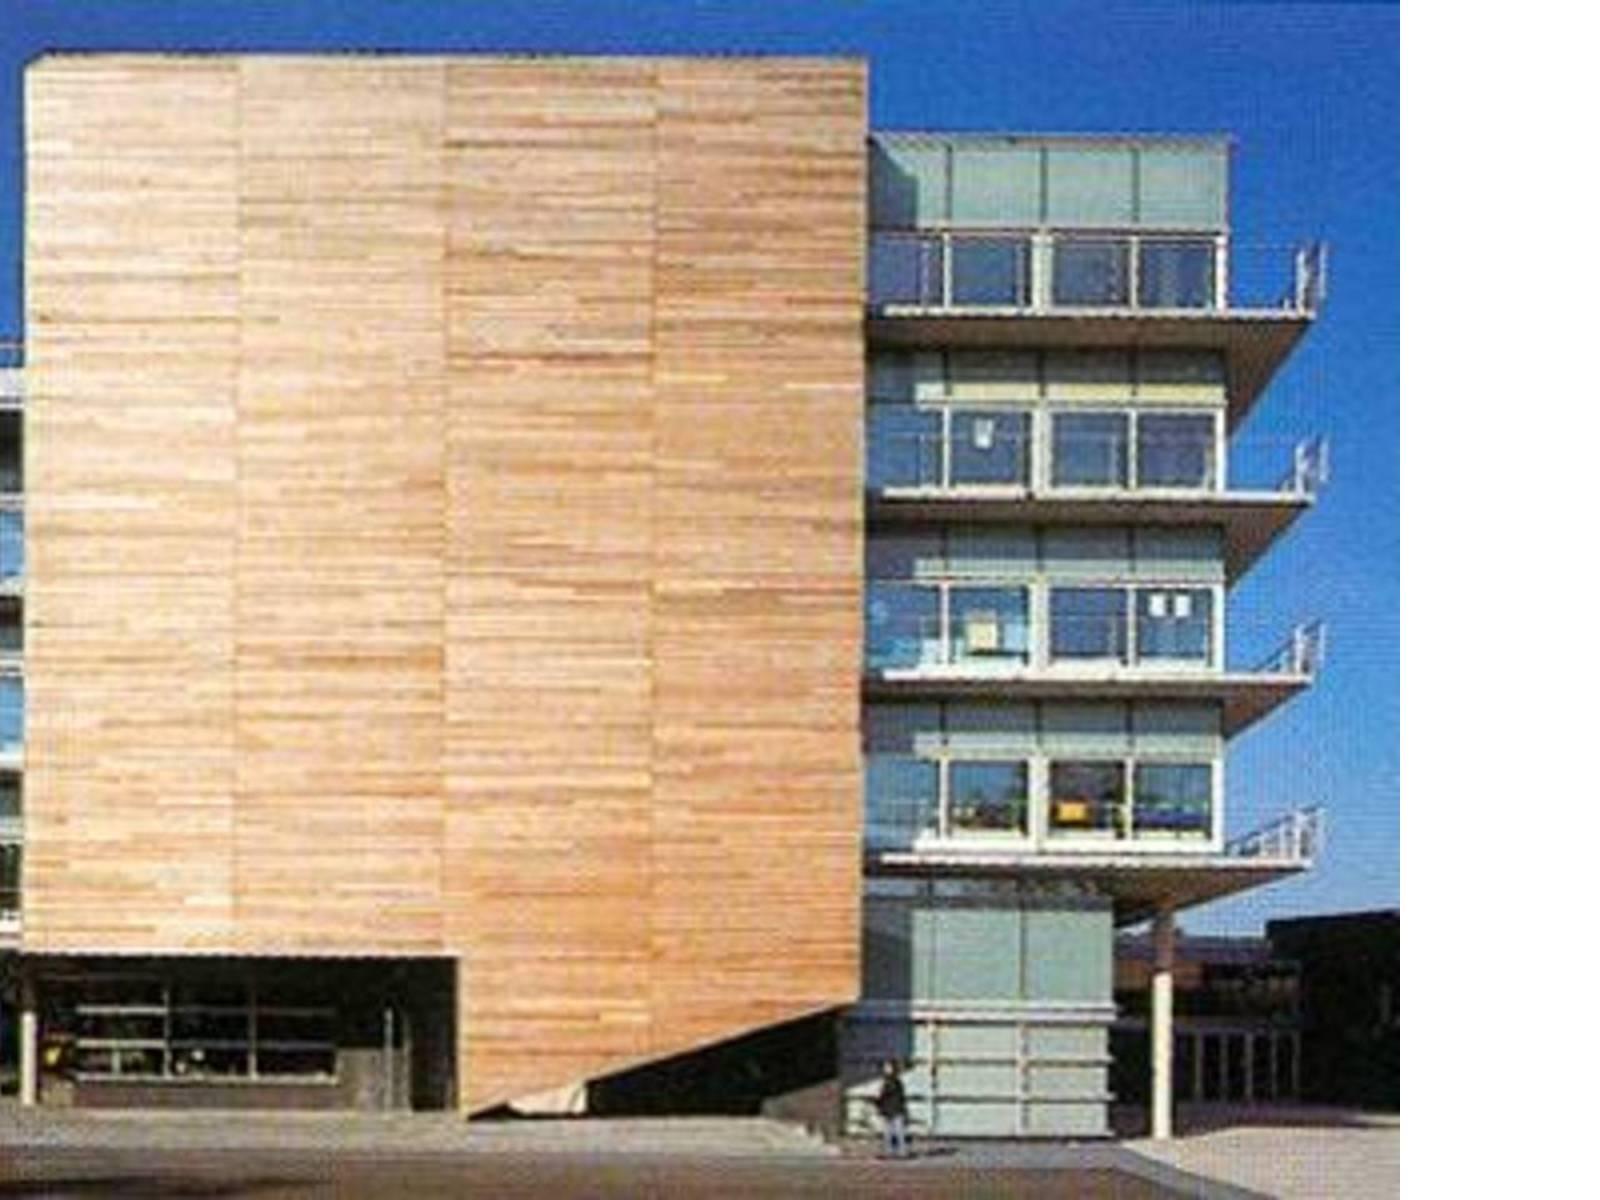 Montessori College Oost, Amsterdam, The Netherlands. Herman Hertzberger